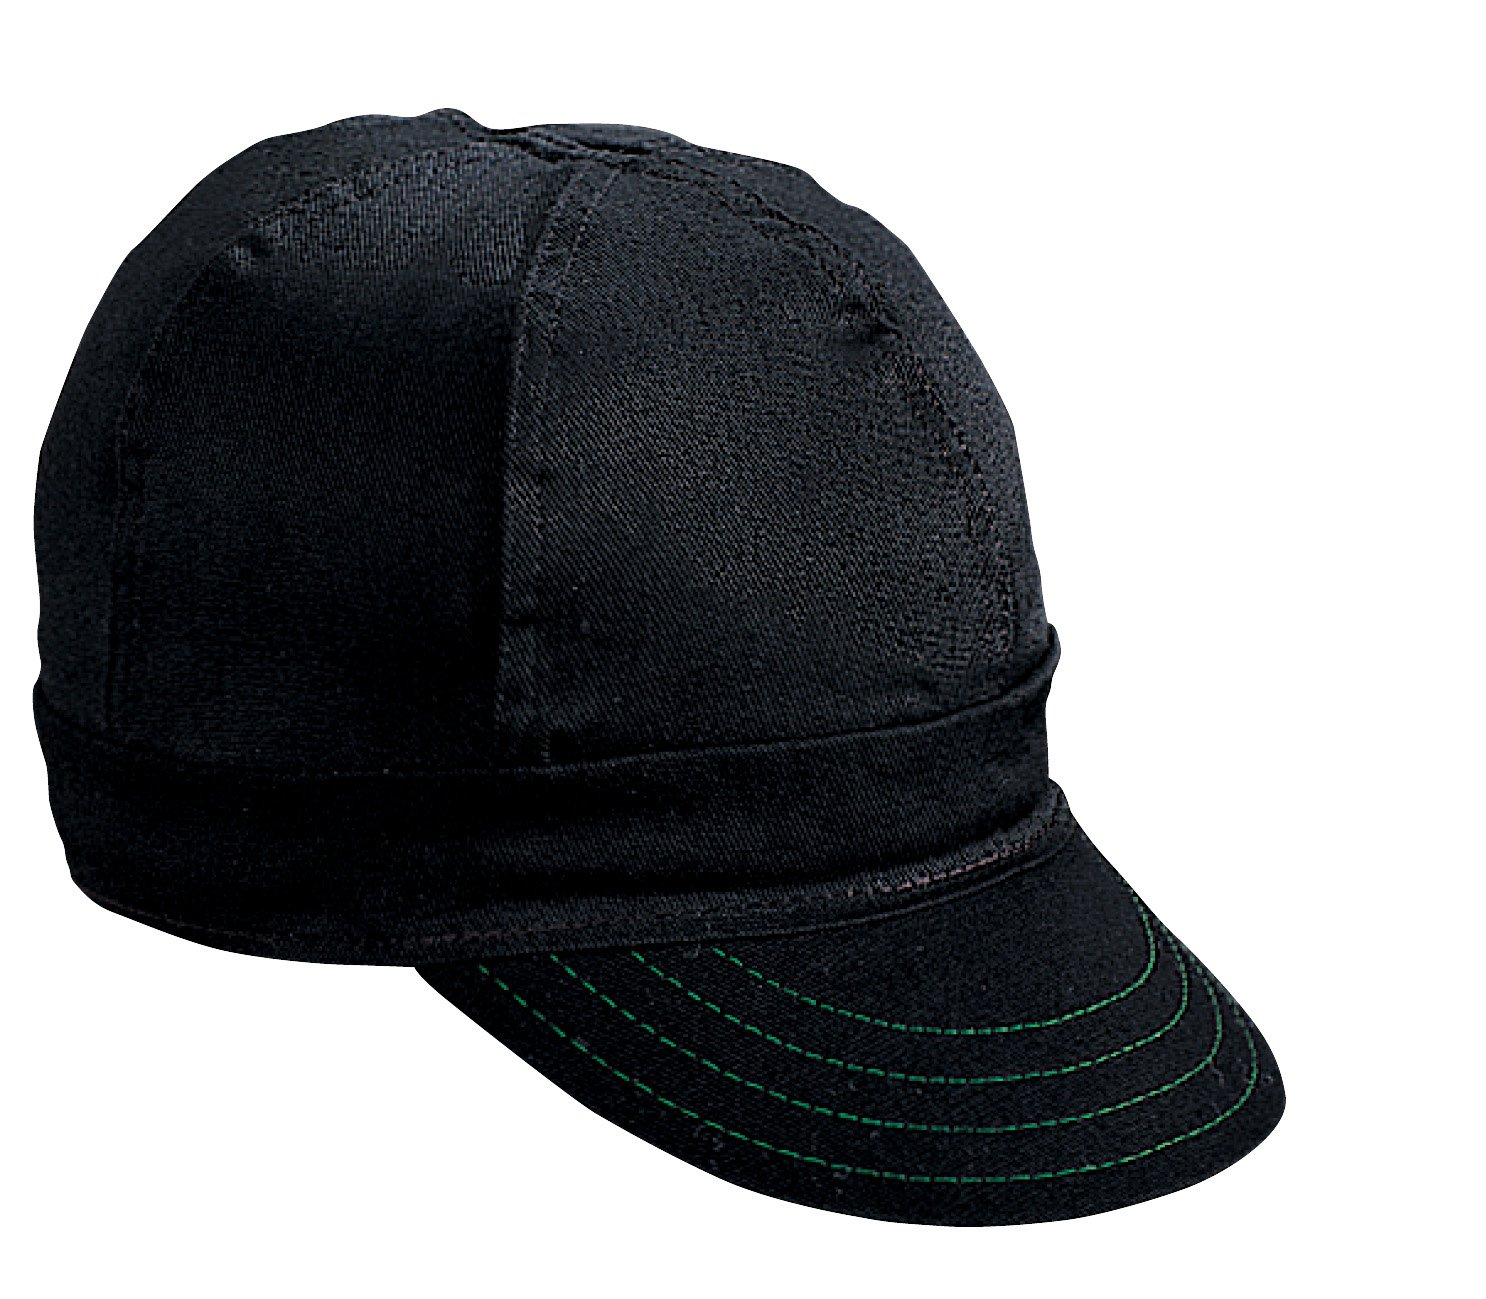 Mutual Industries 00250-00000-7625 Kromer Black Welder Cap, Cotton, Length 5', Width 6' Length 5 Width 6